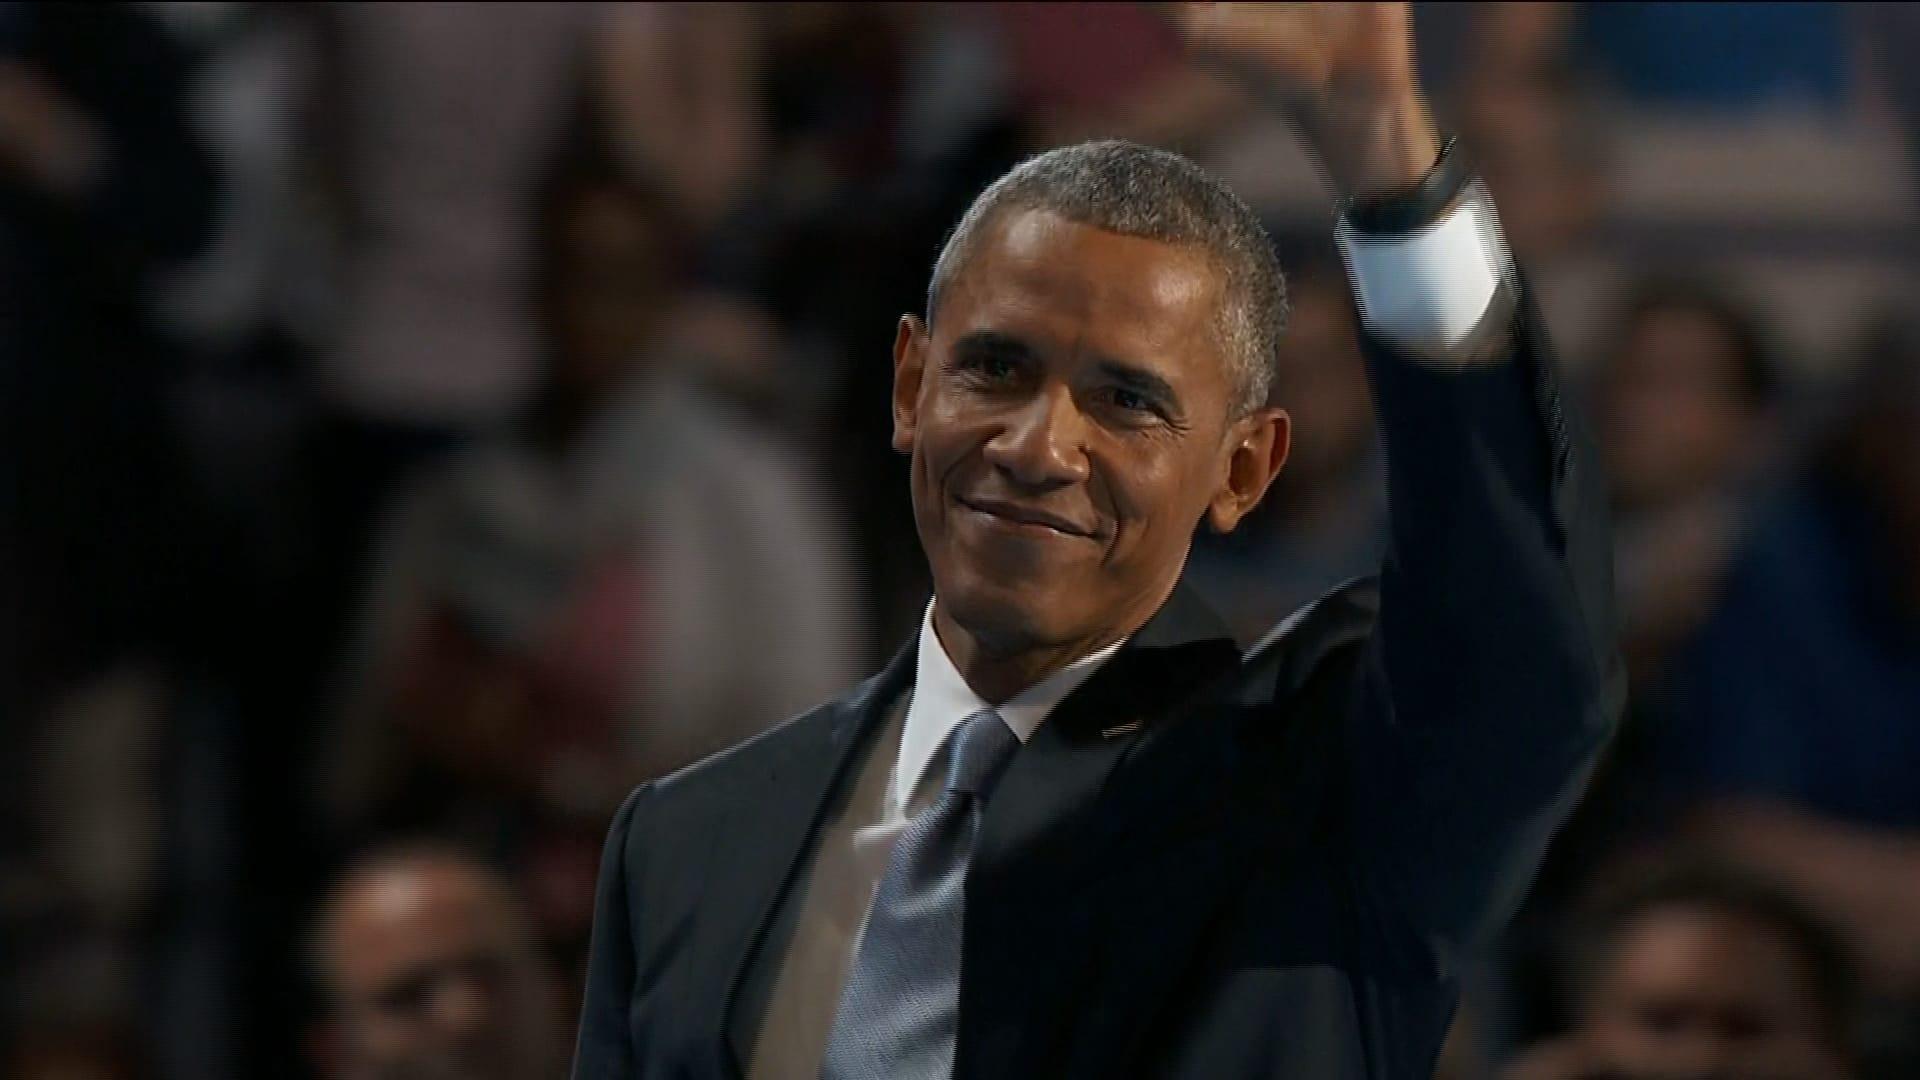 self reliance and other essays epub filesbarack obama election essay